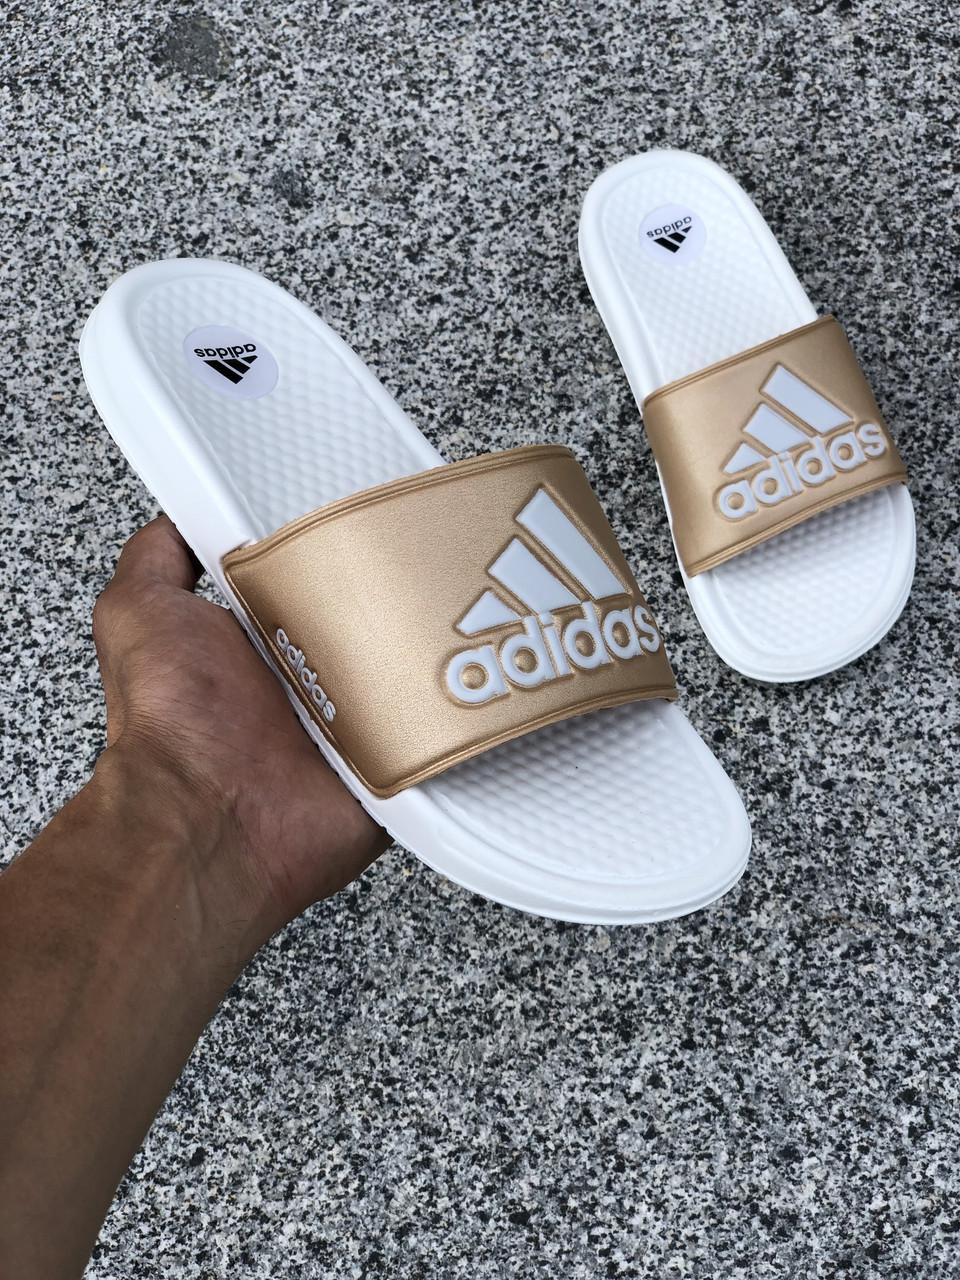 Женские сланцы Adidas, реплика